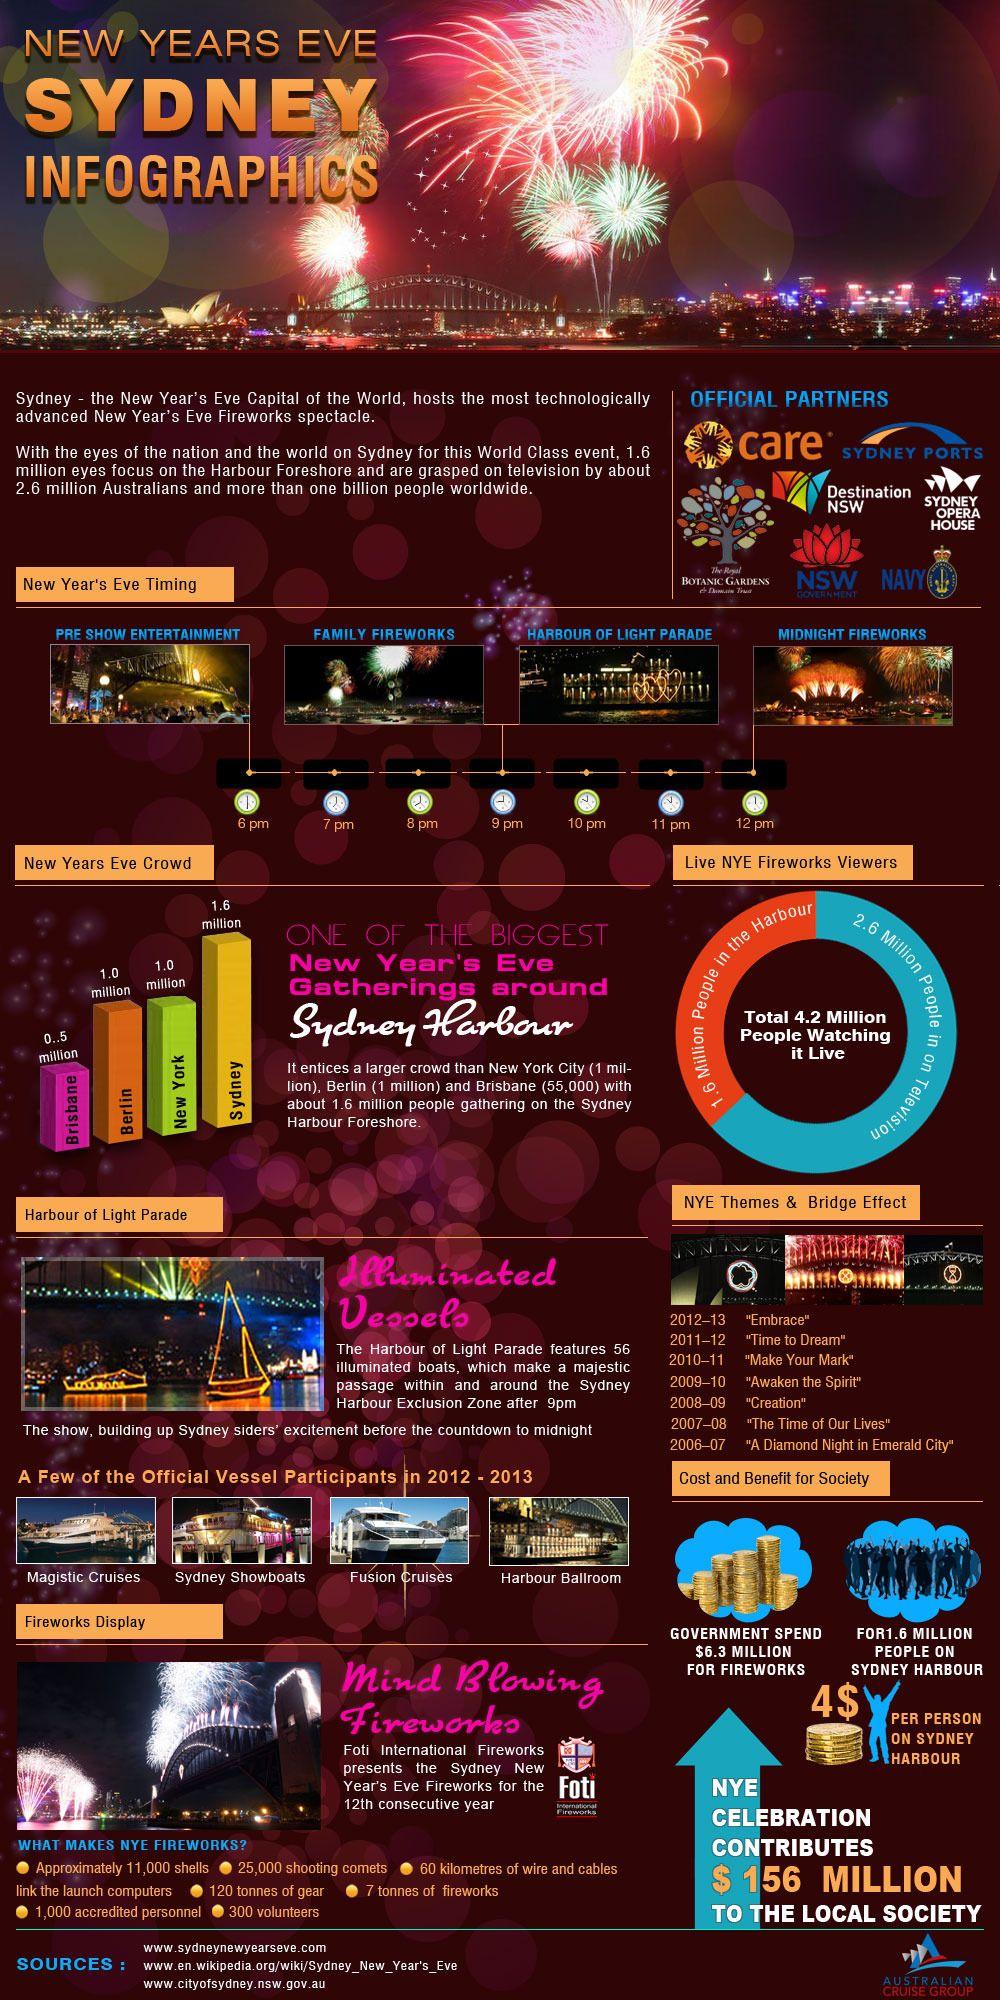 New Year Fireworks Sydney NSW Australia infographic